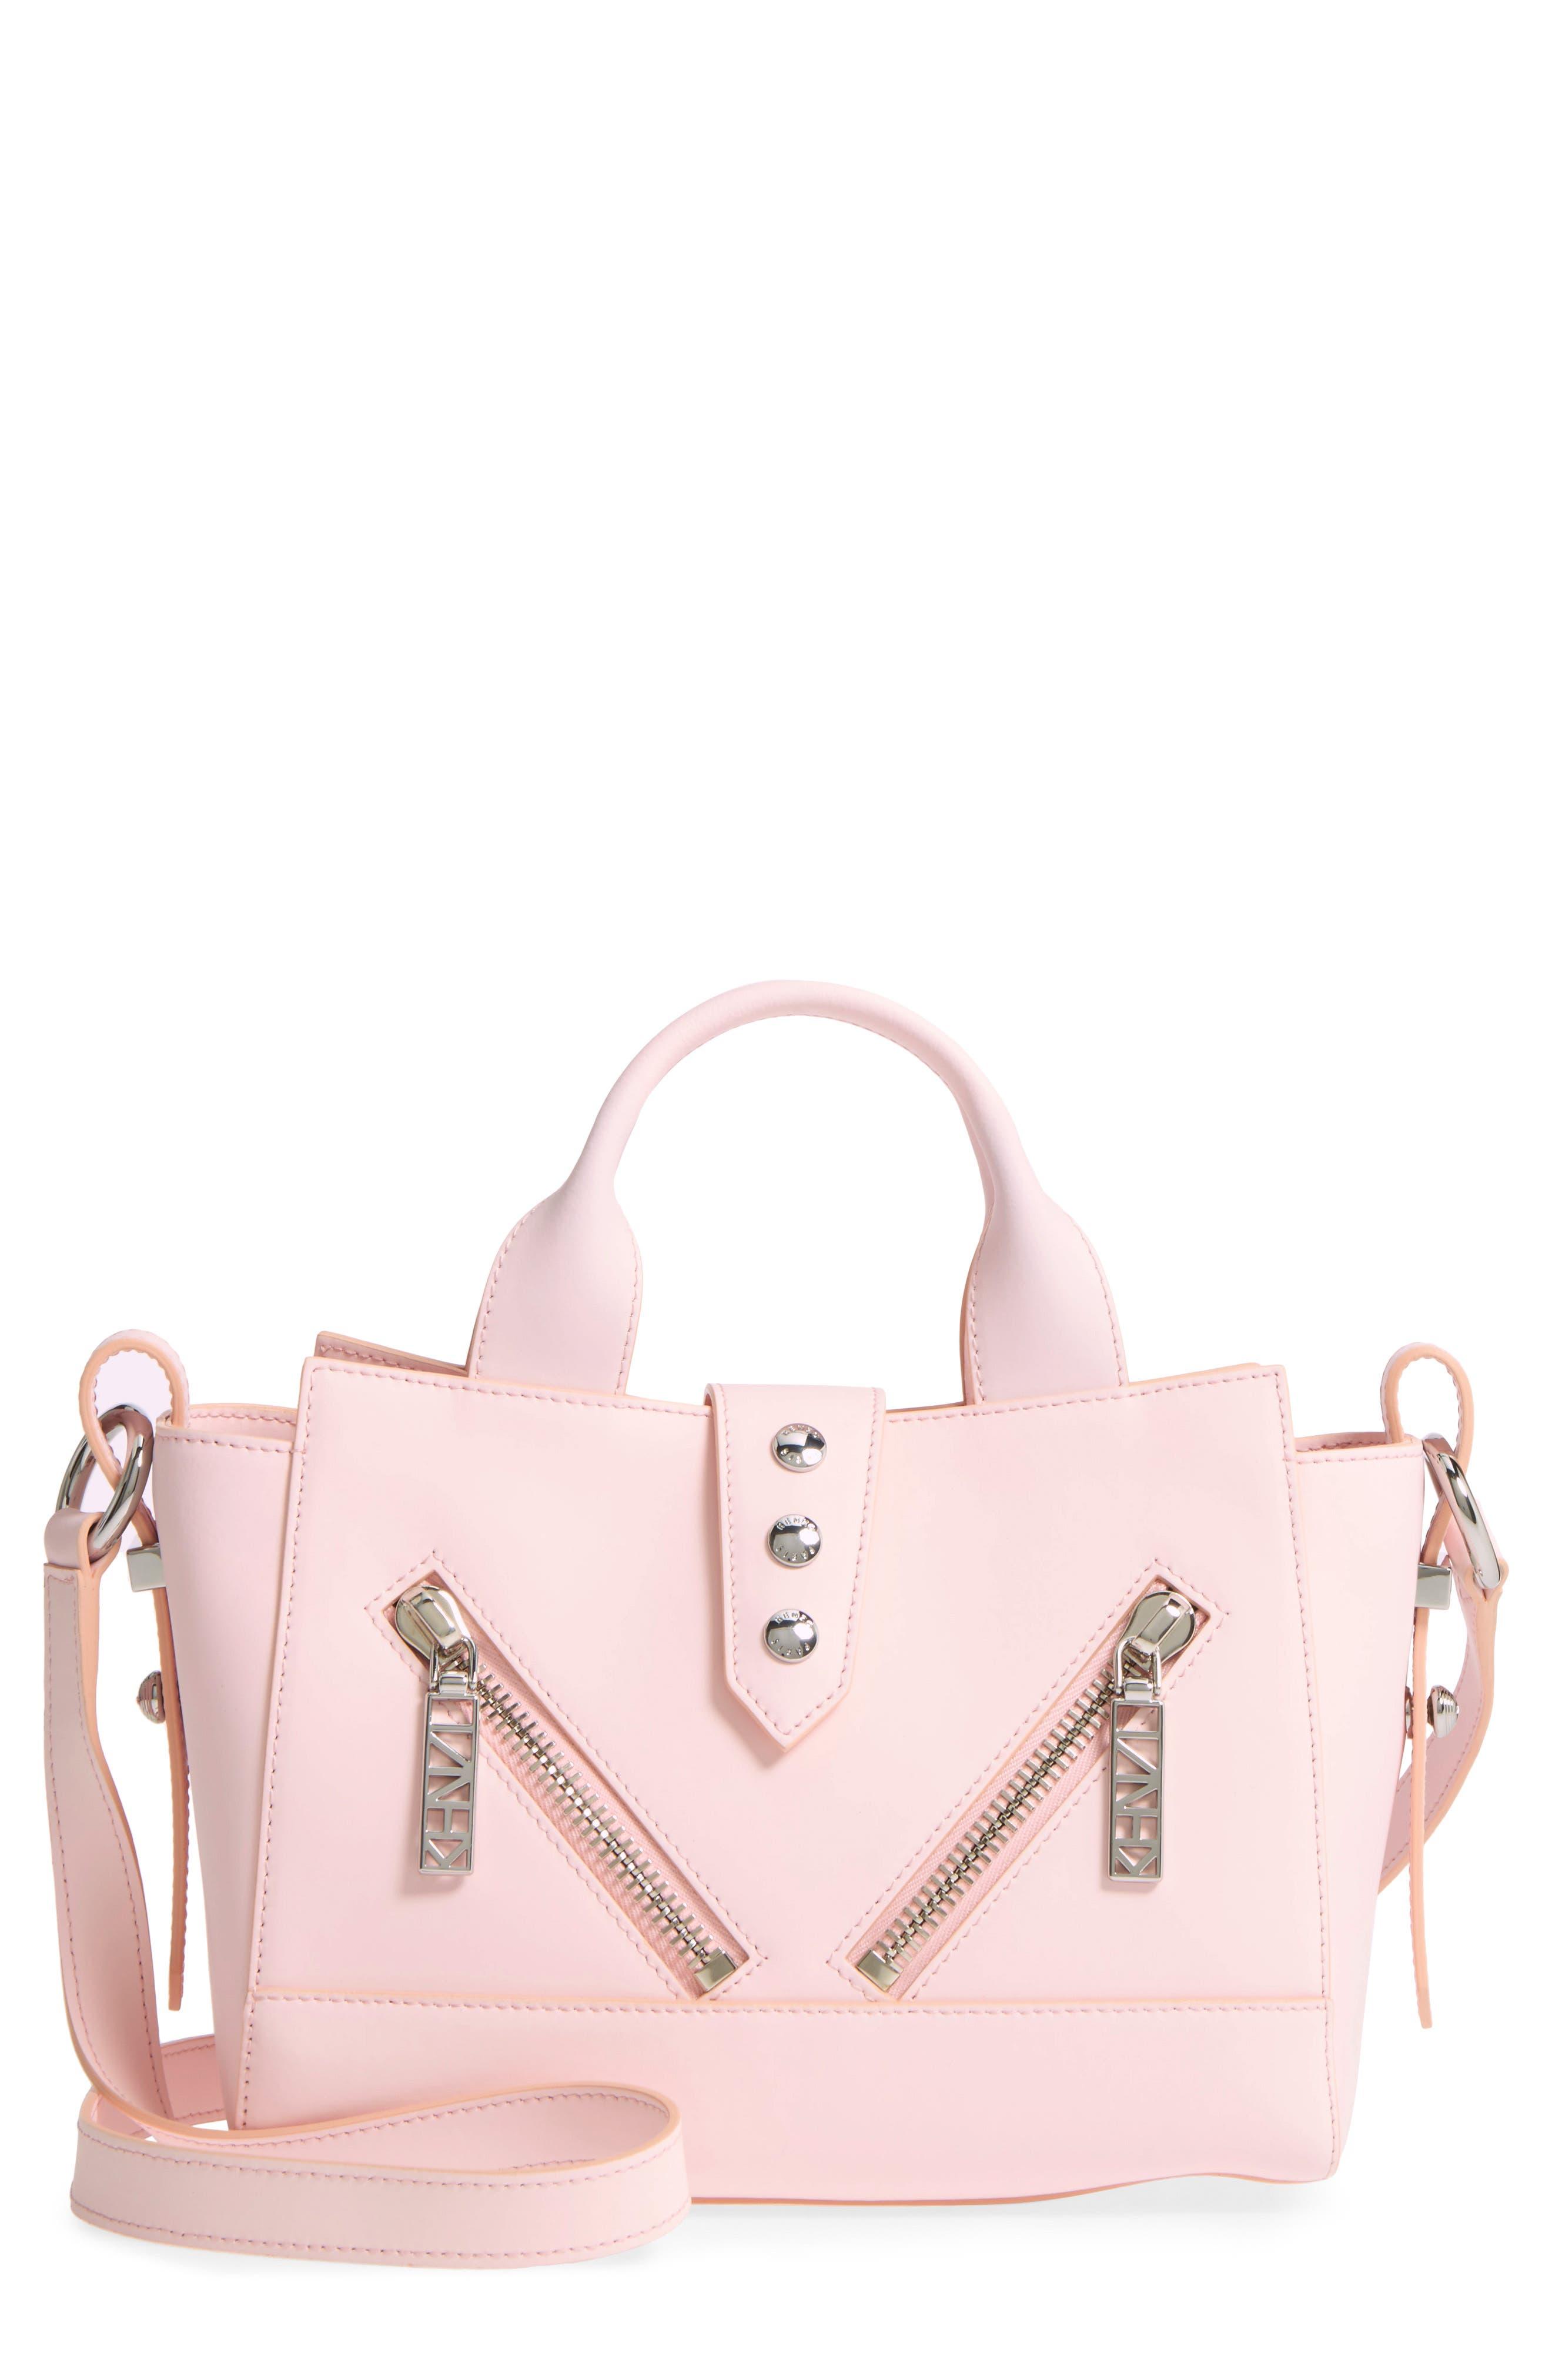 'Mini Kalifornia' Leather Satchel,                             Main thumbnail 1, color,                             Faded Pink